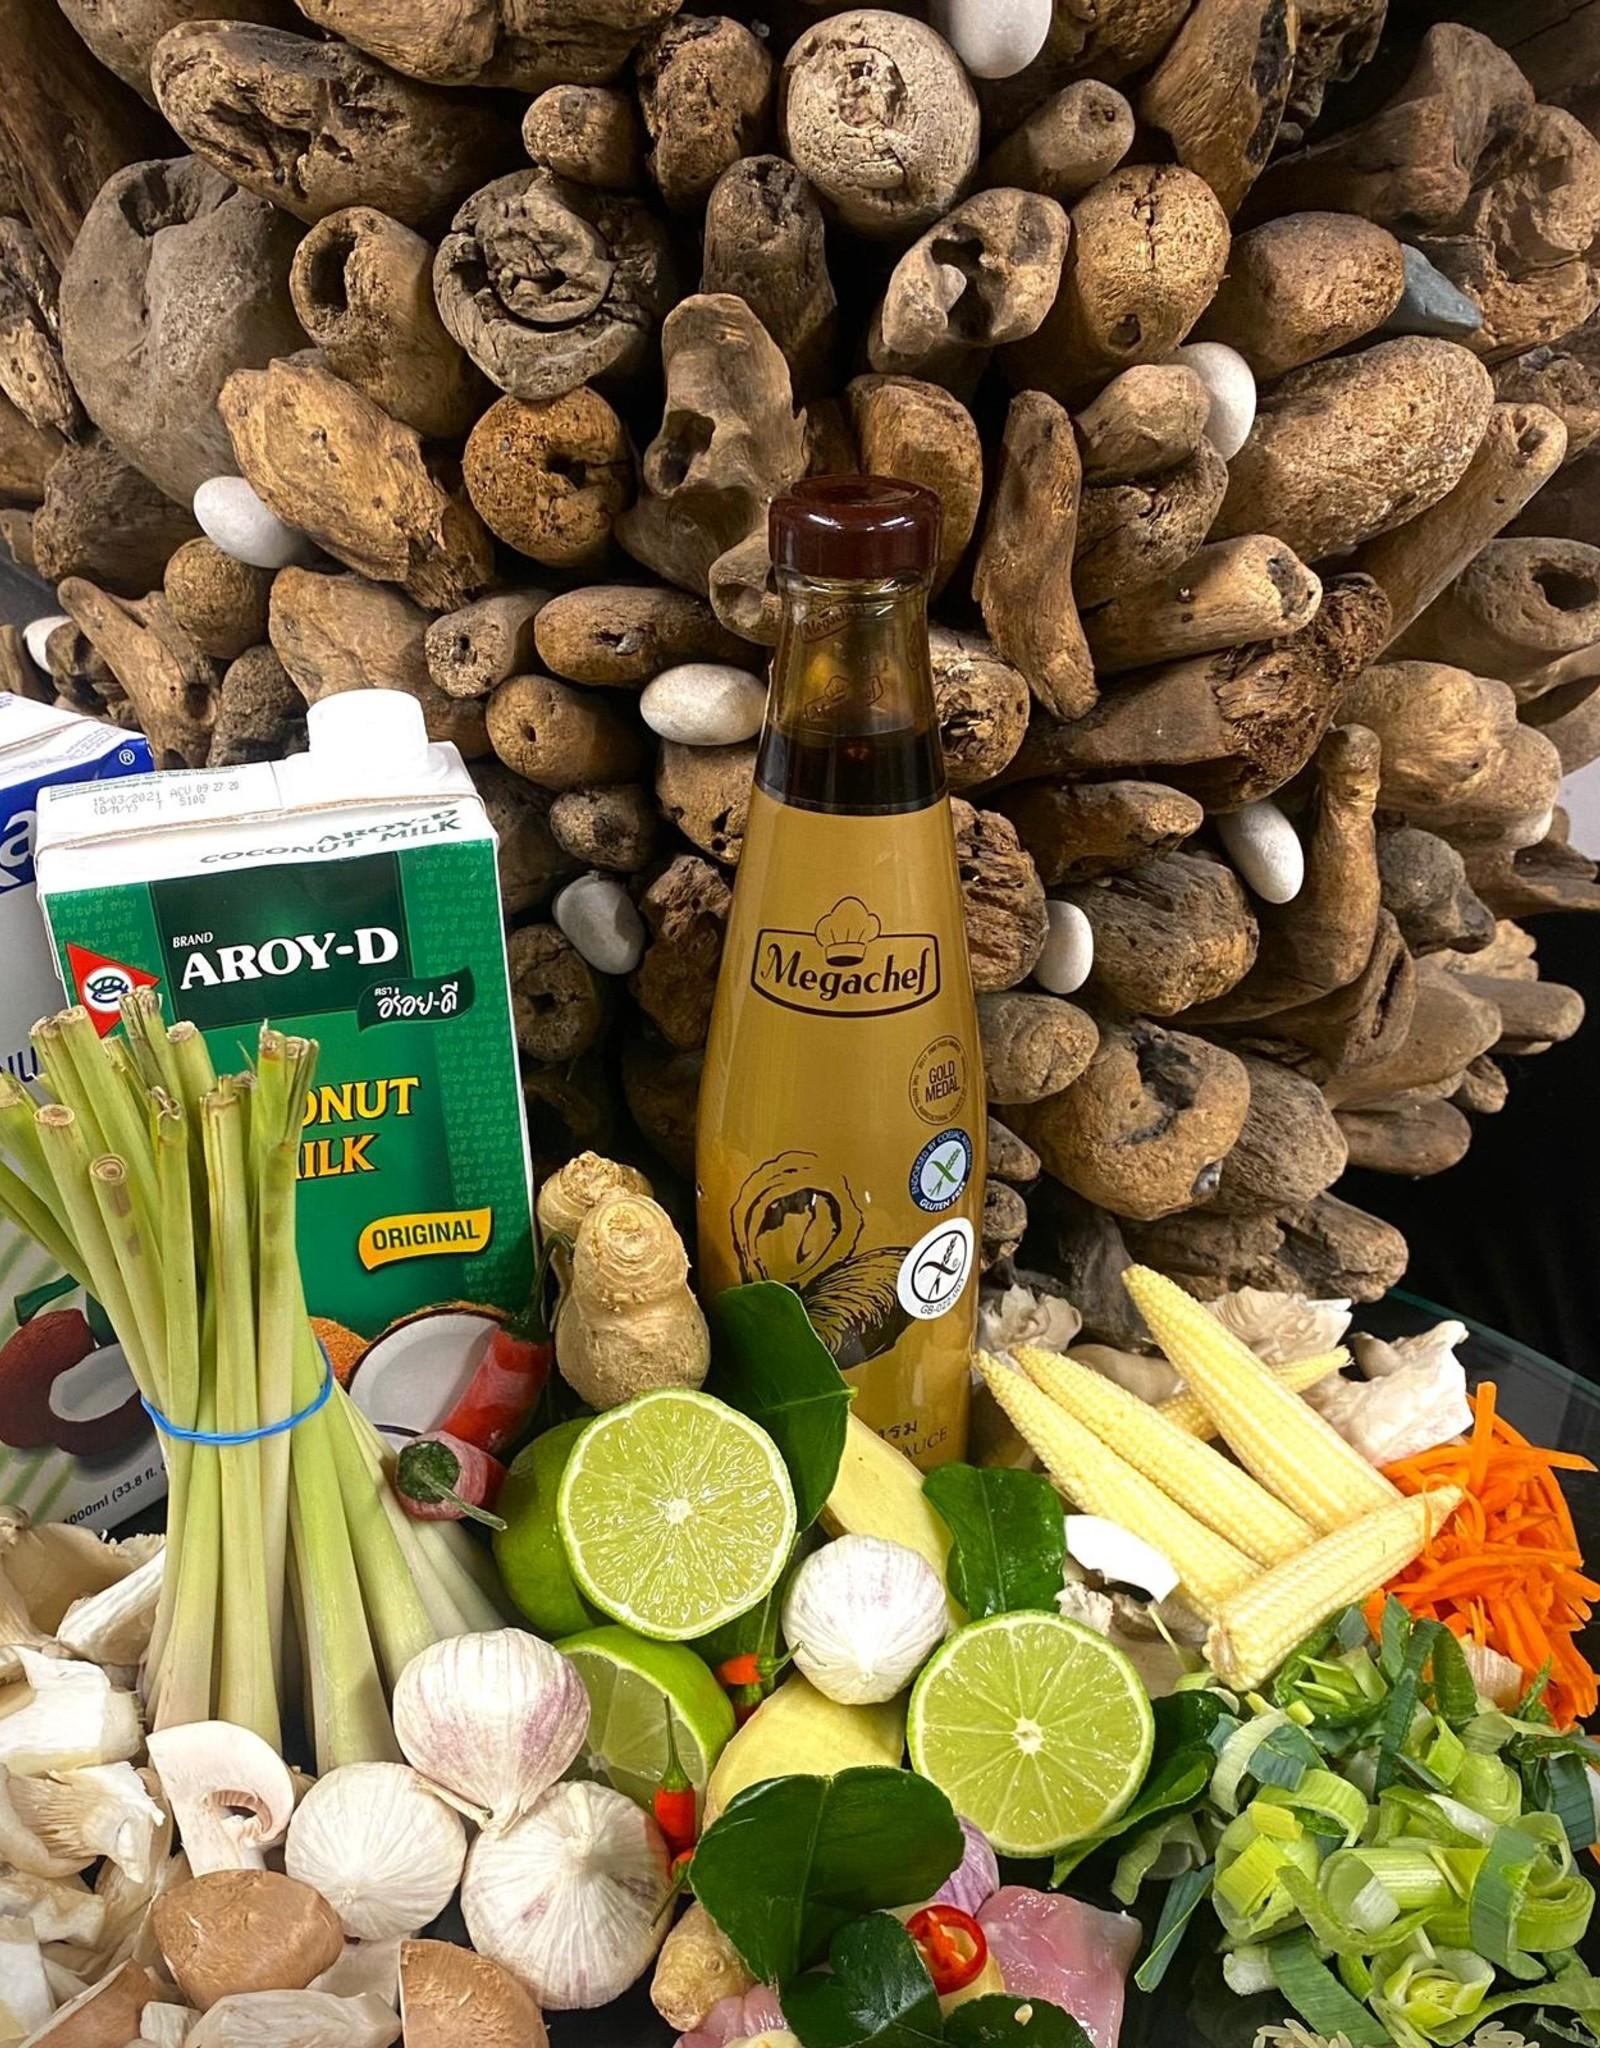 Tom Ka Kai soep met kip, kokos, citroengras, limoen en peper